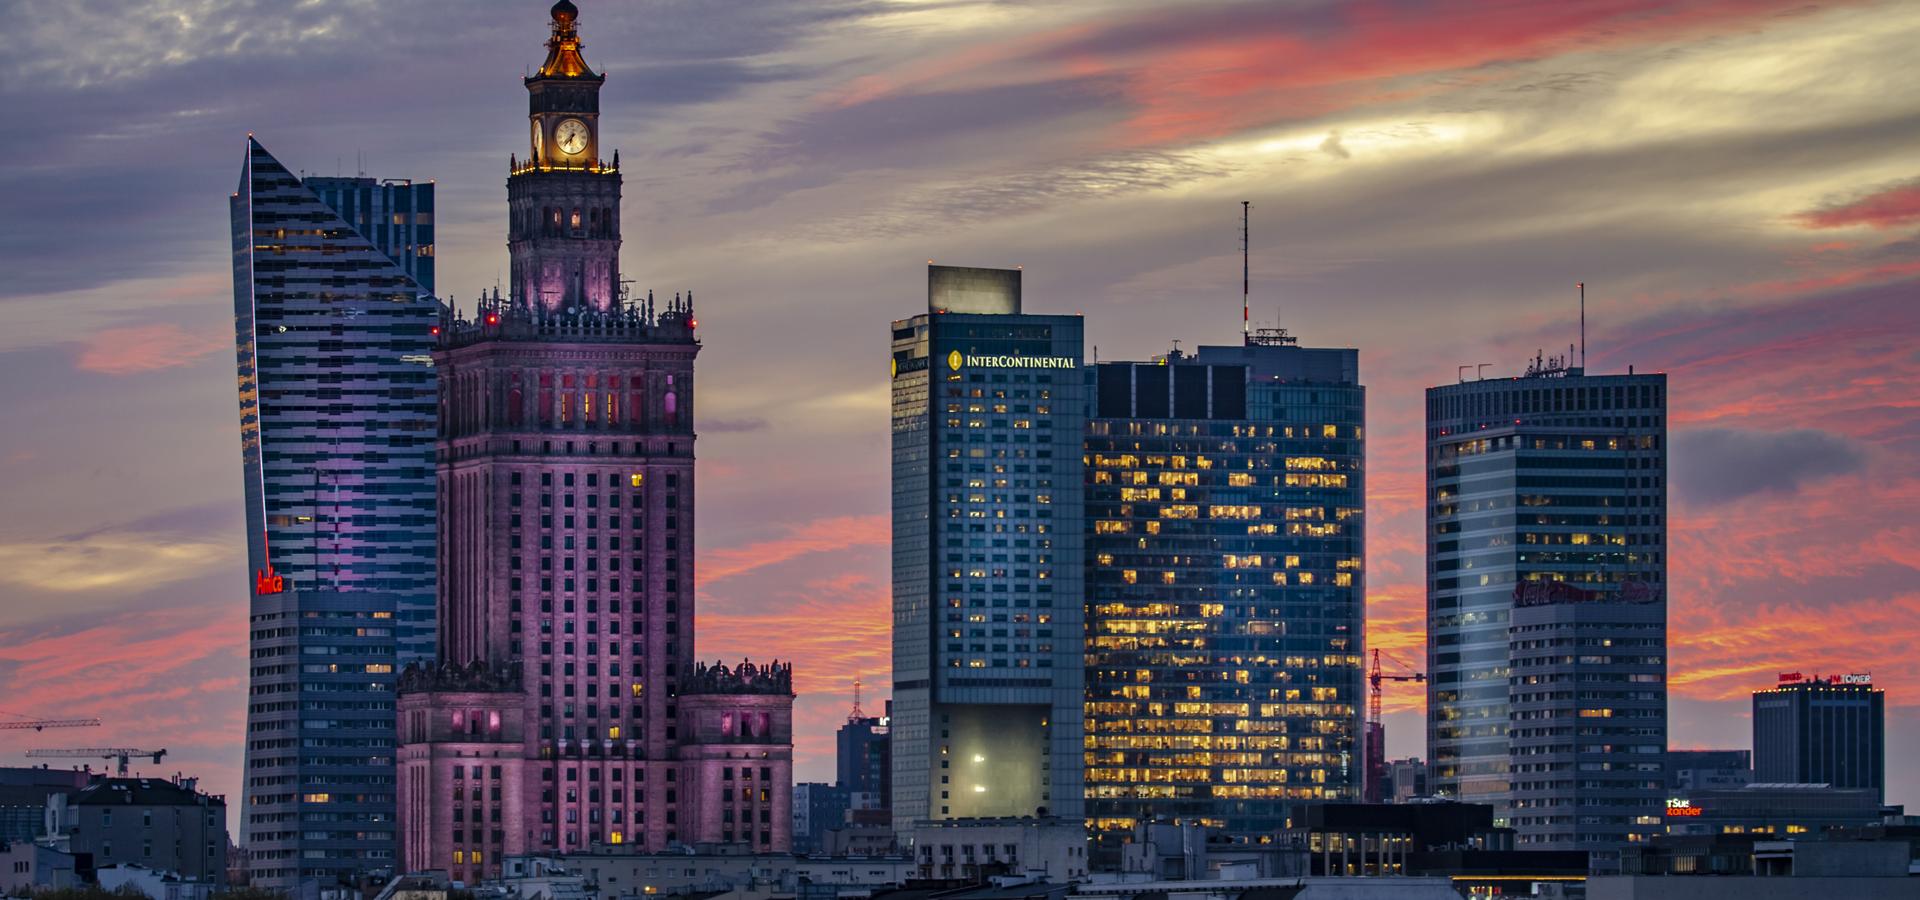 Peer-to-peer advisory in Ząbki, Masovian Voivodeship, Poland